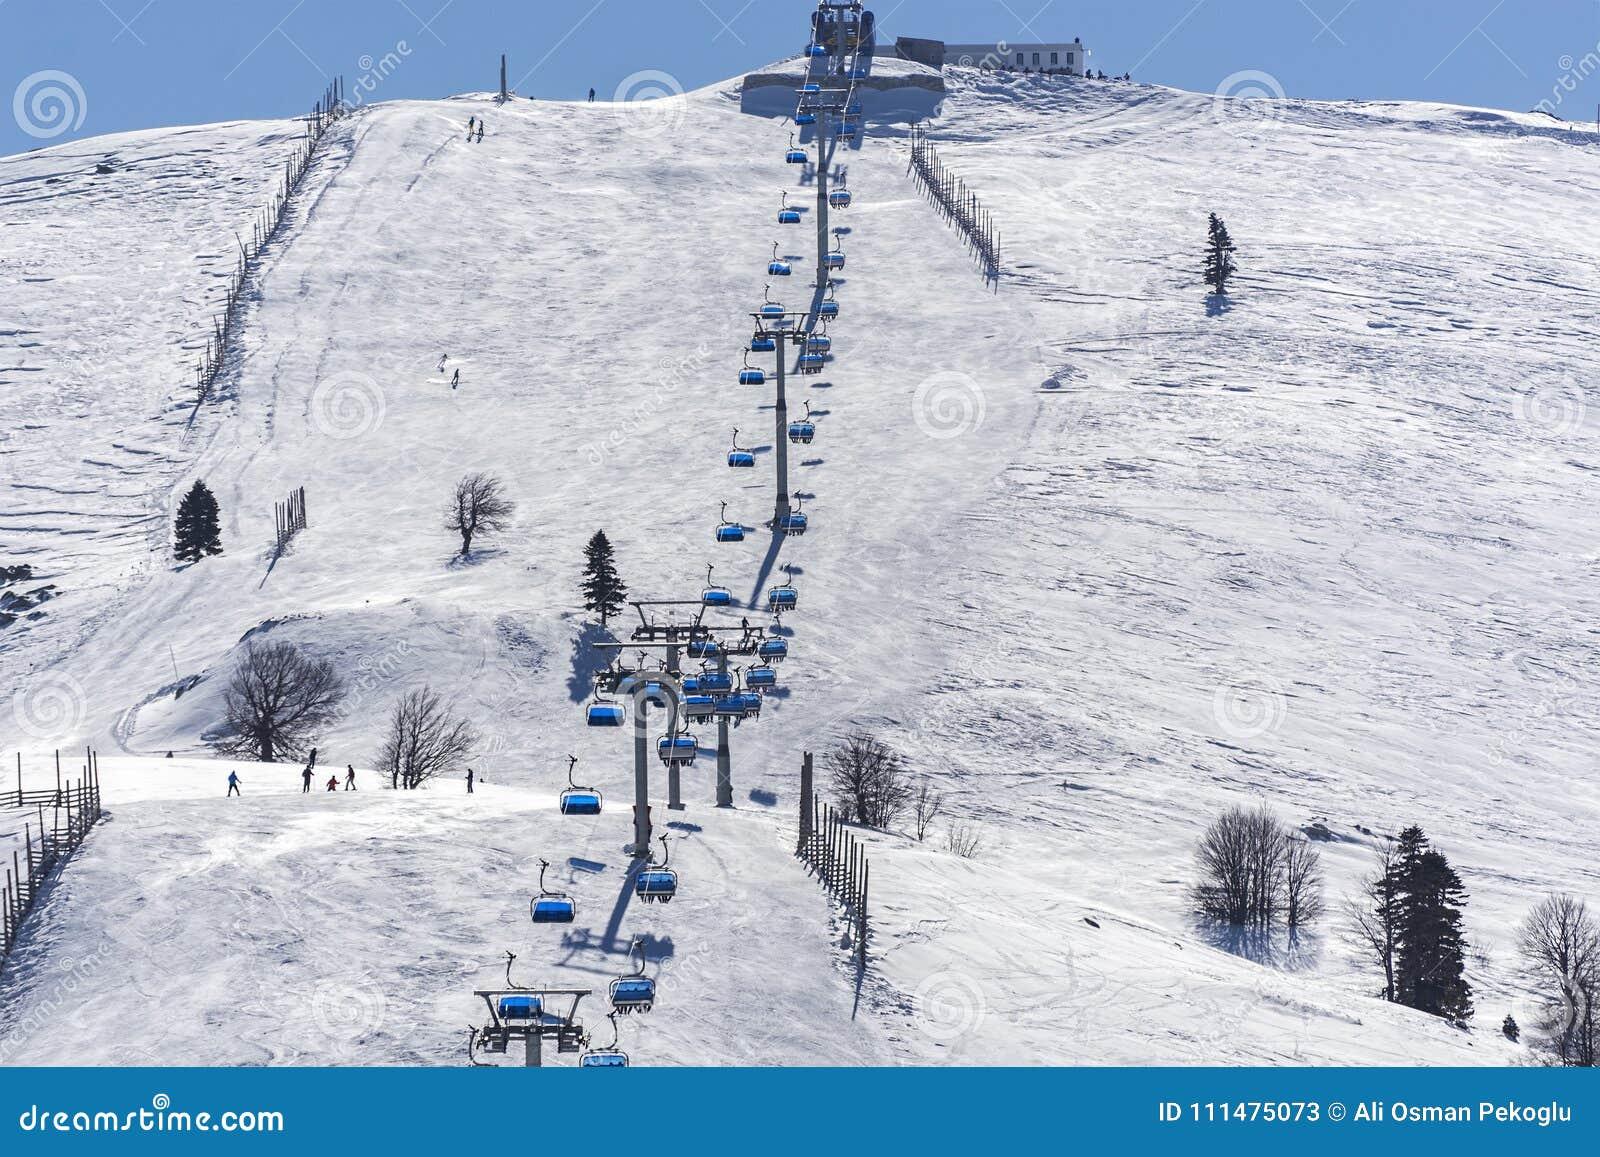 uludag mountain view. uludag mountain is ski resort of turkey. stock